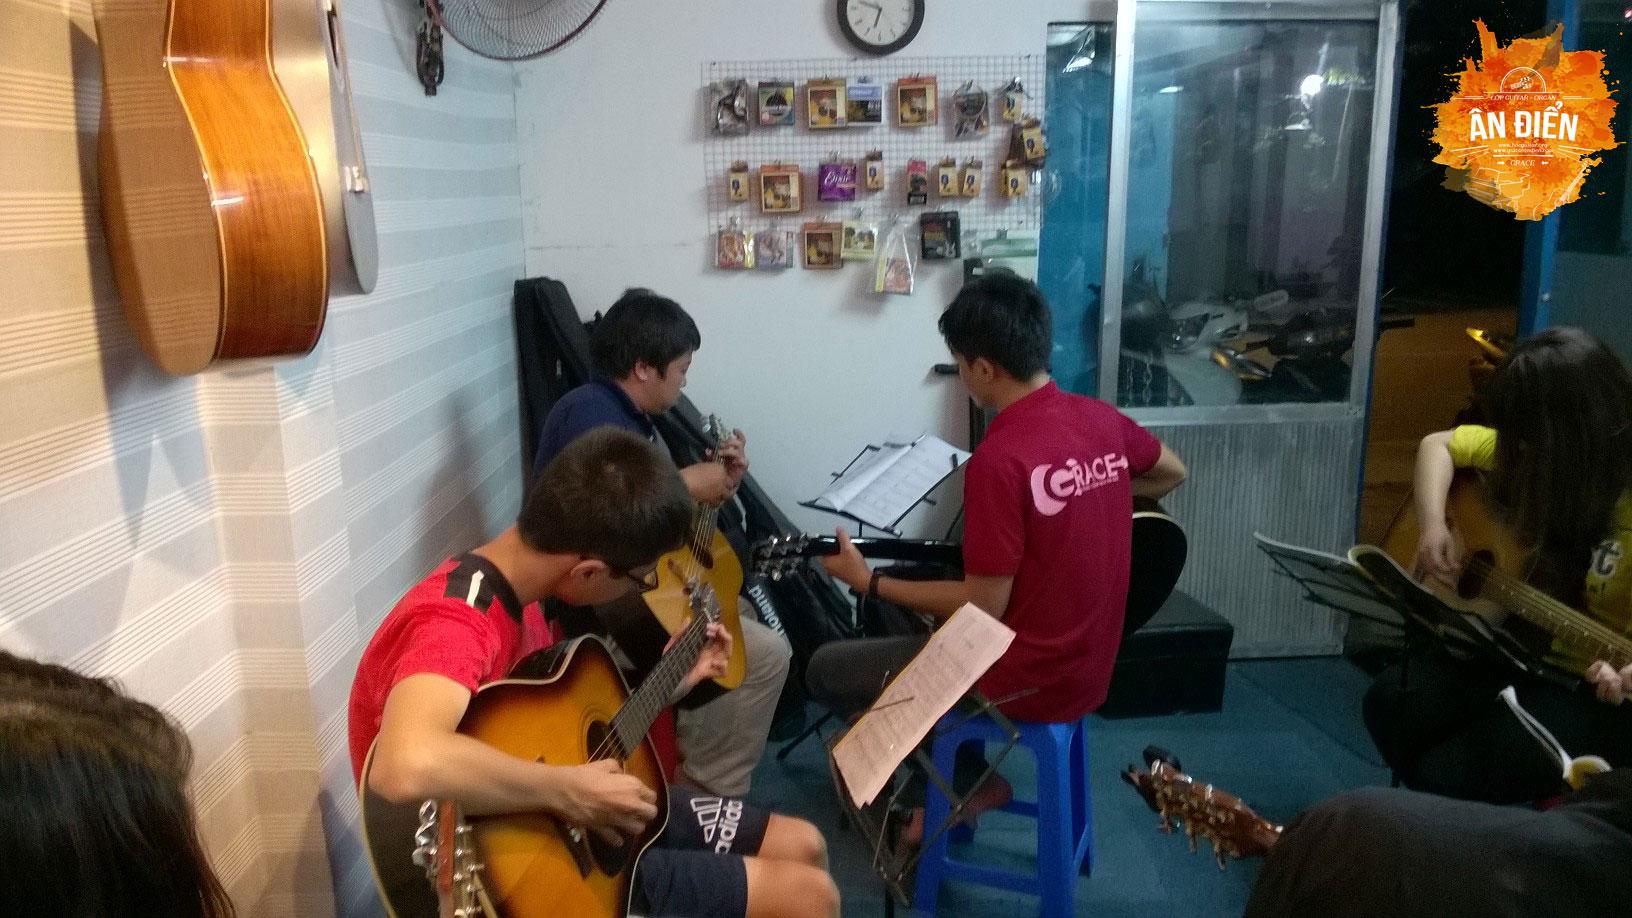 day dan guitar tan binh tan phu phu nhuan quan 10 tphcm 2